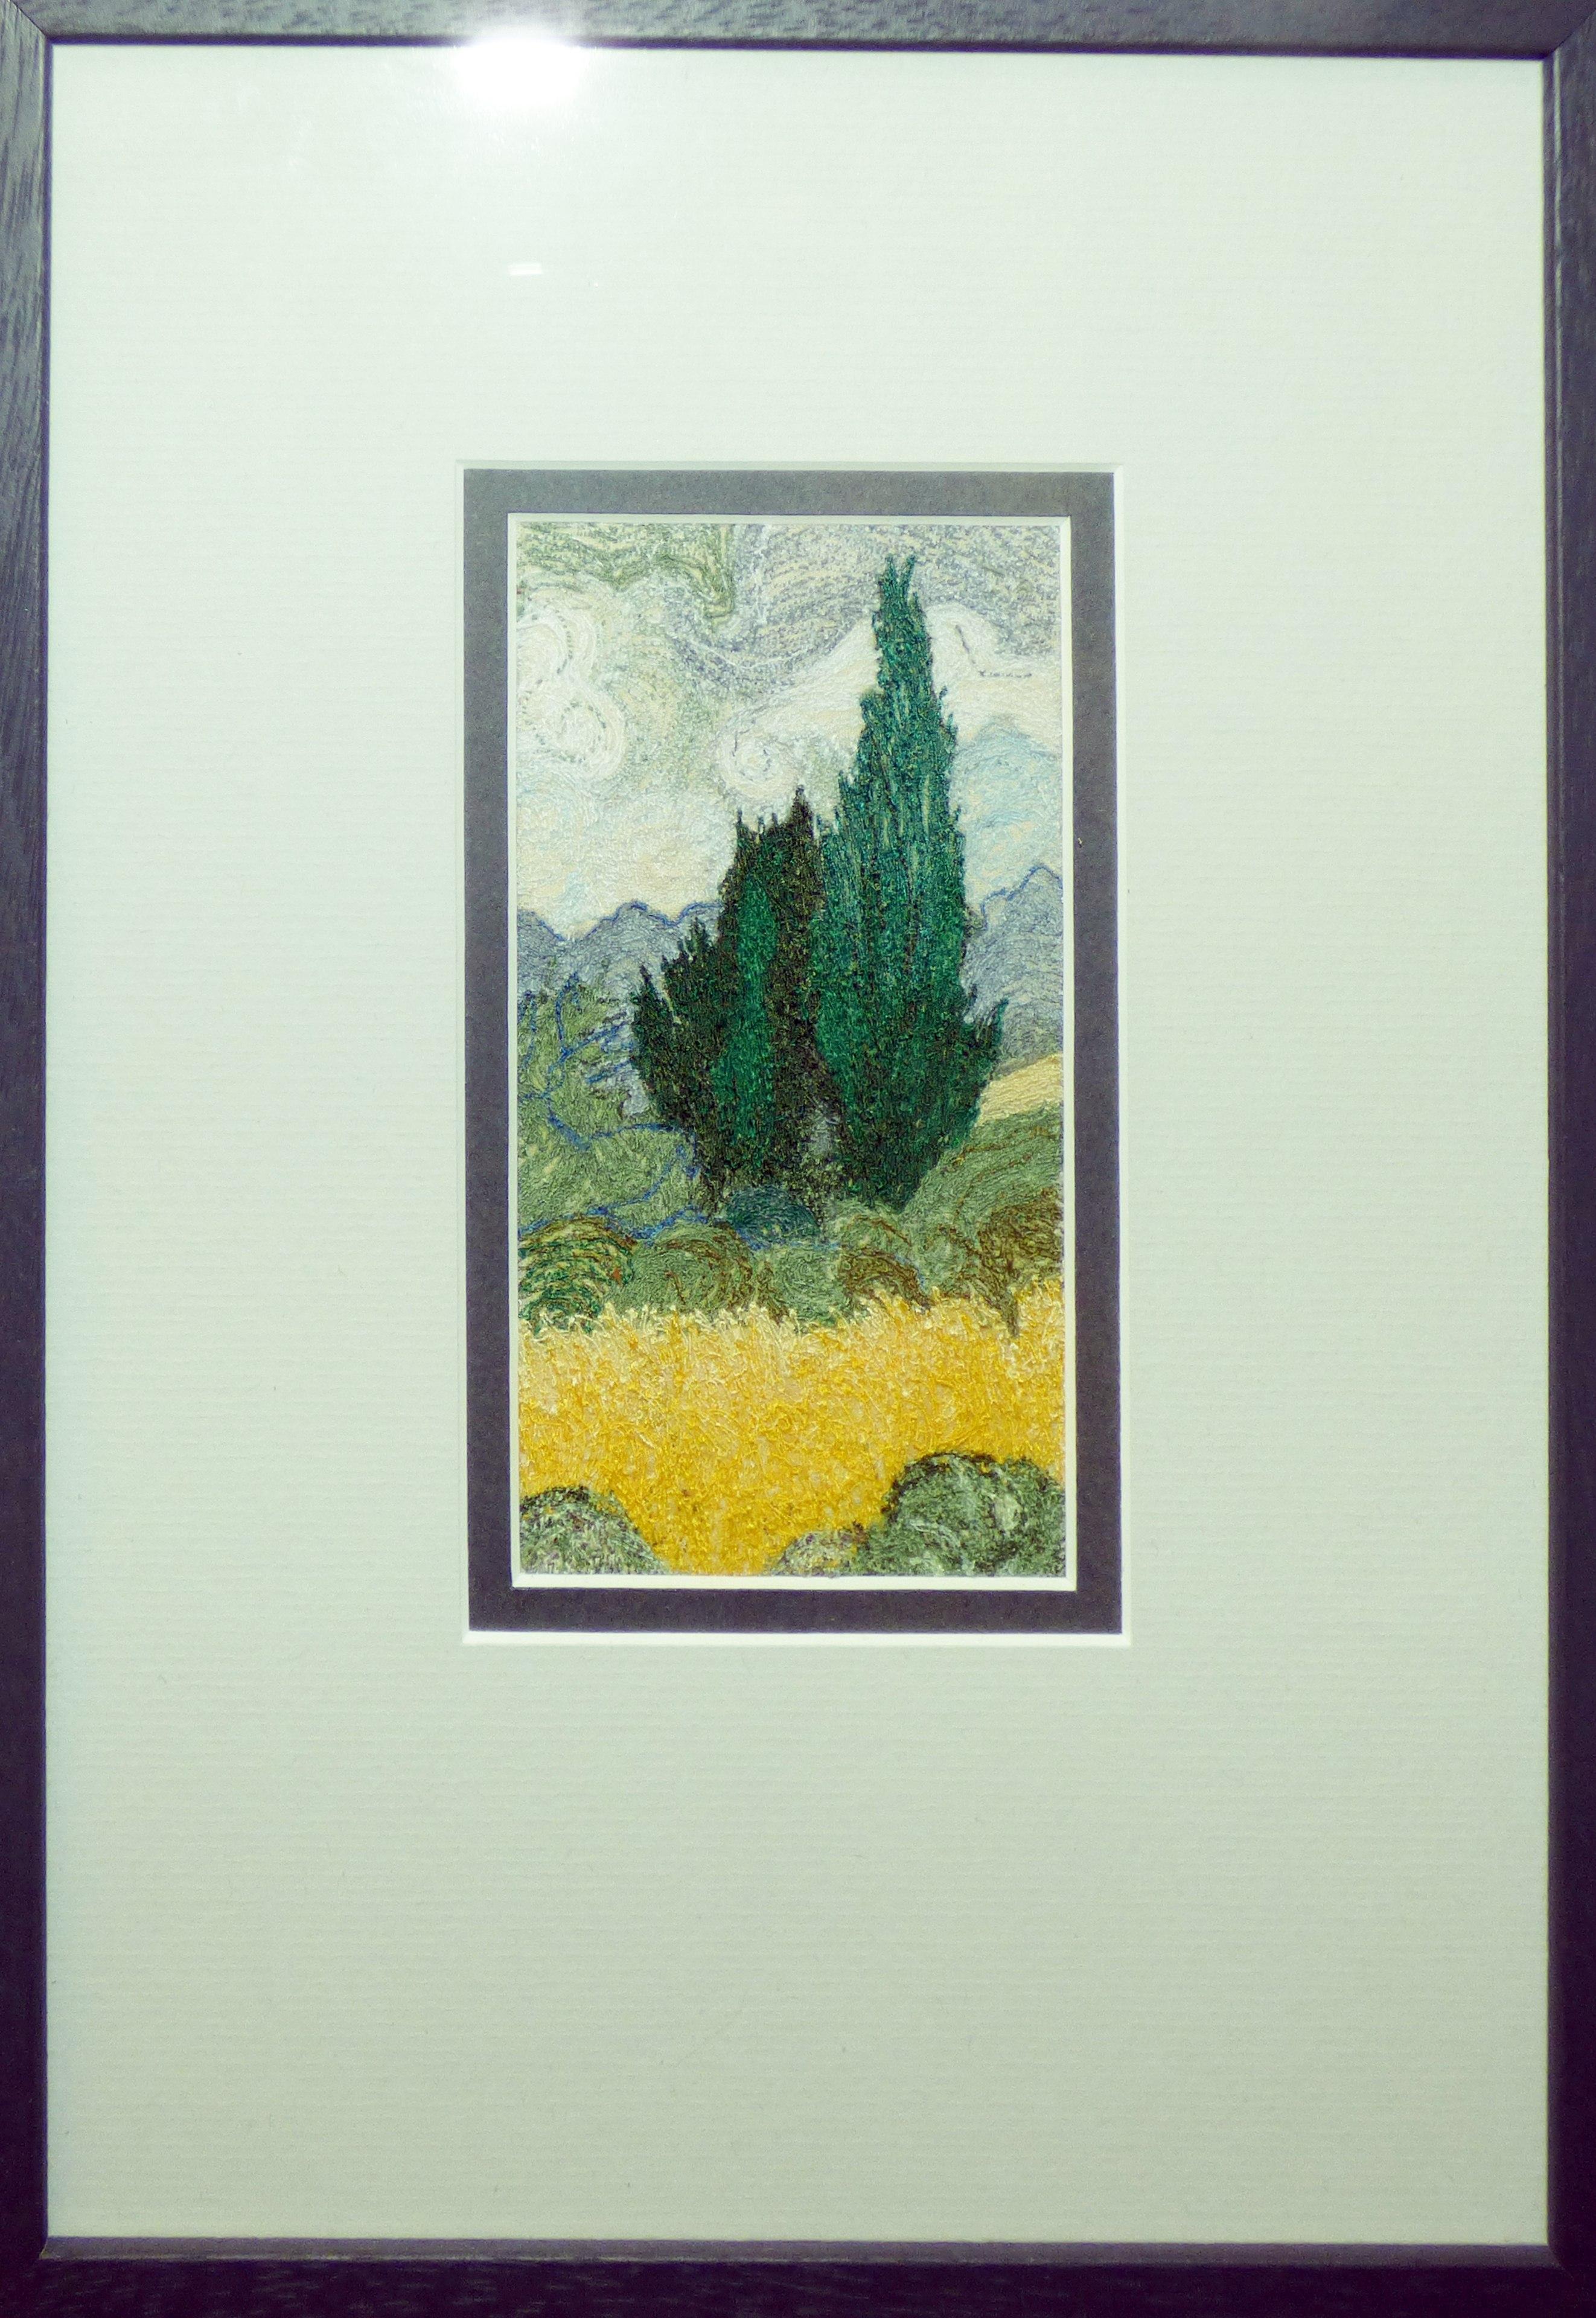 VAN GOGH'S TREE by Grace Mitchell, machine stitching